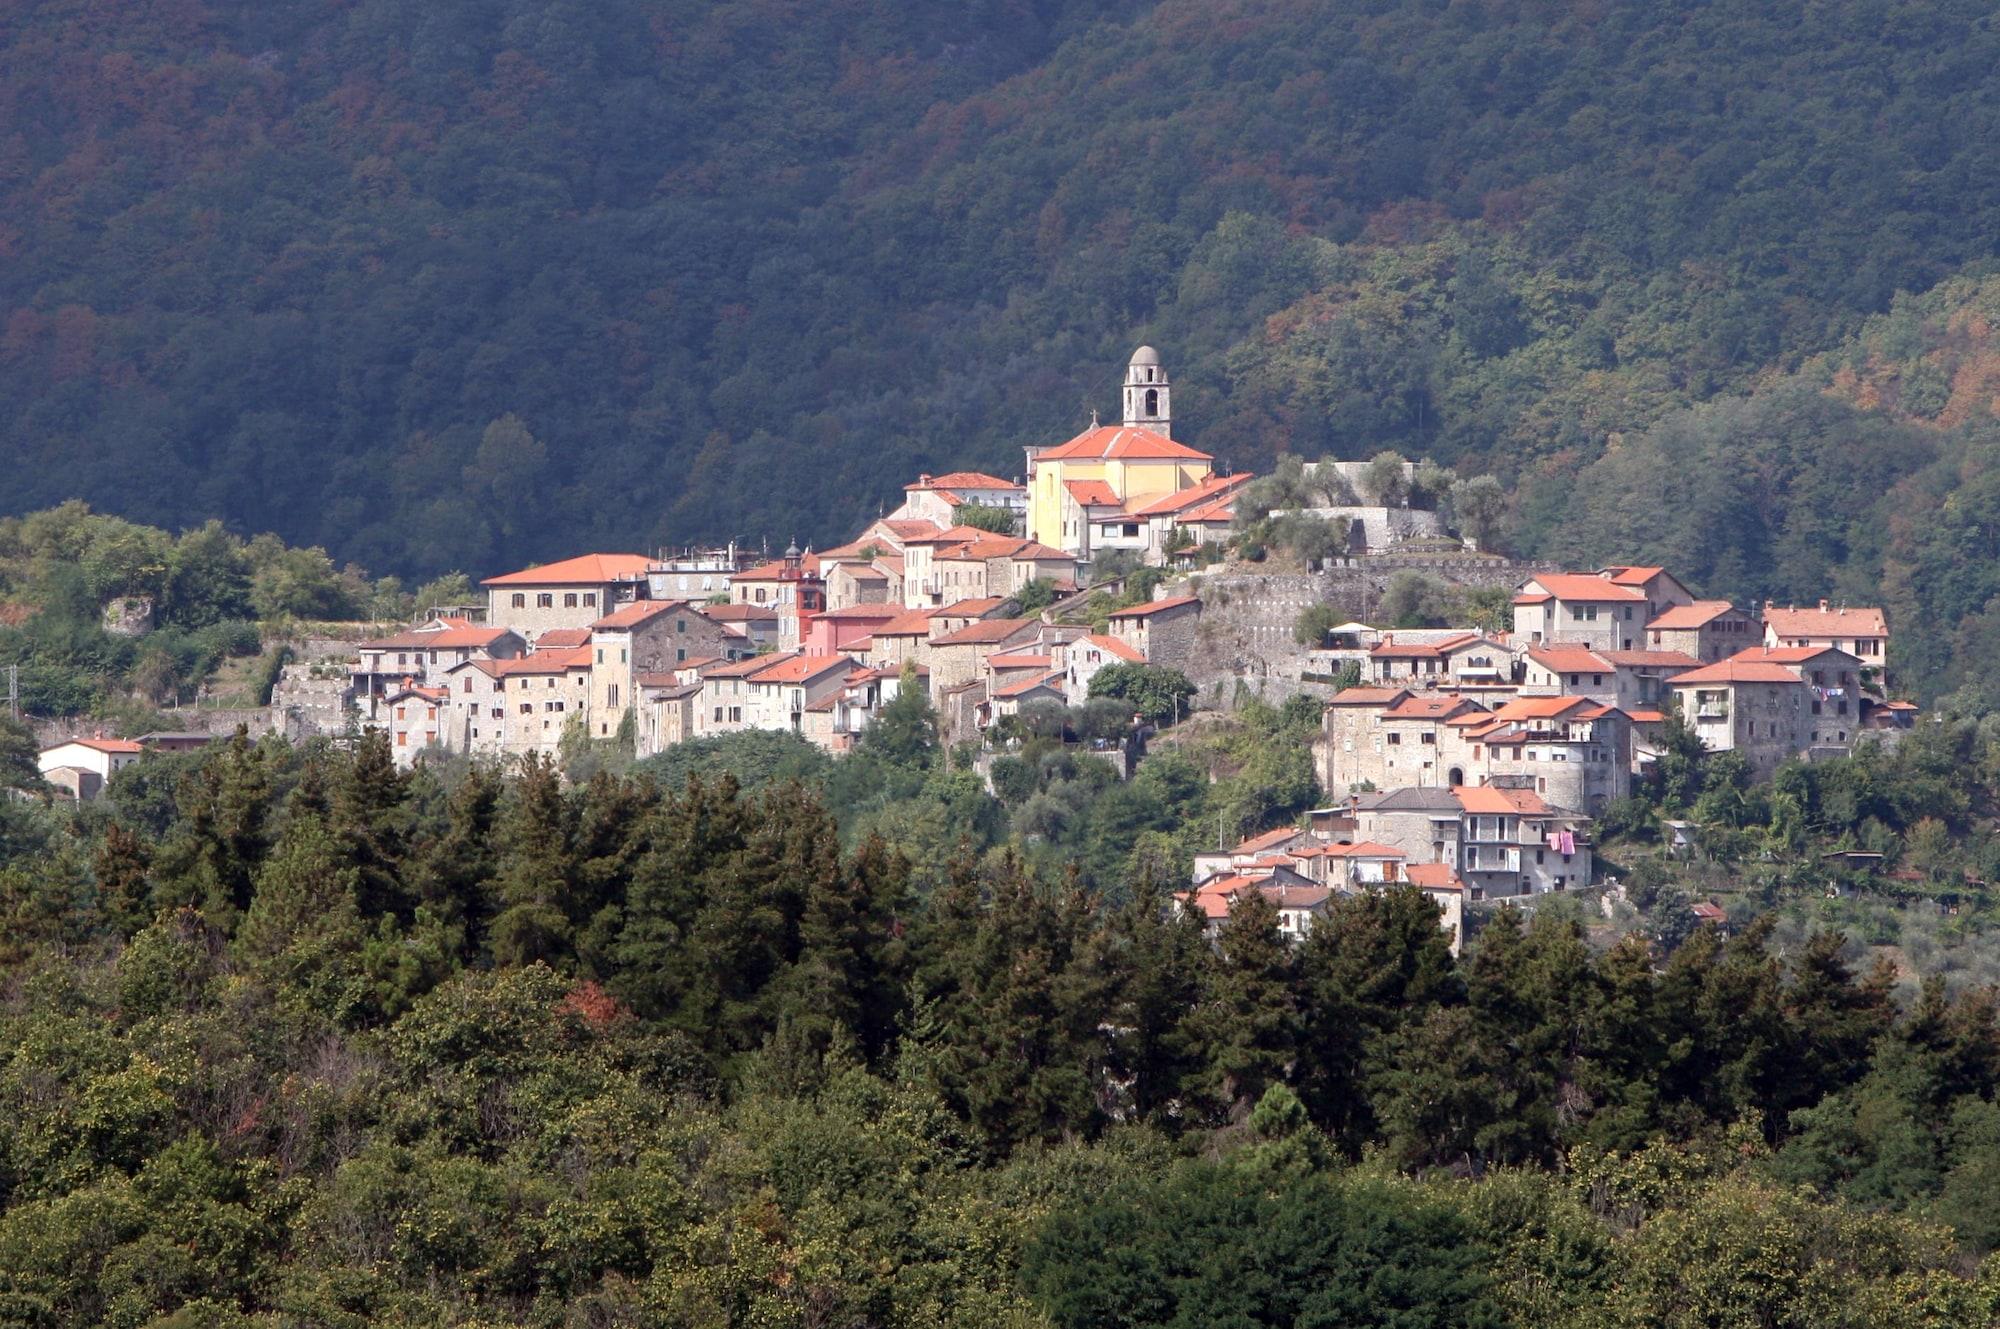 Park Hotel La Pineta, Massa Carrara